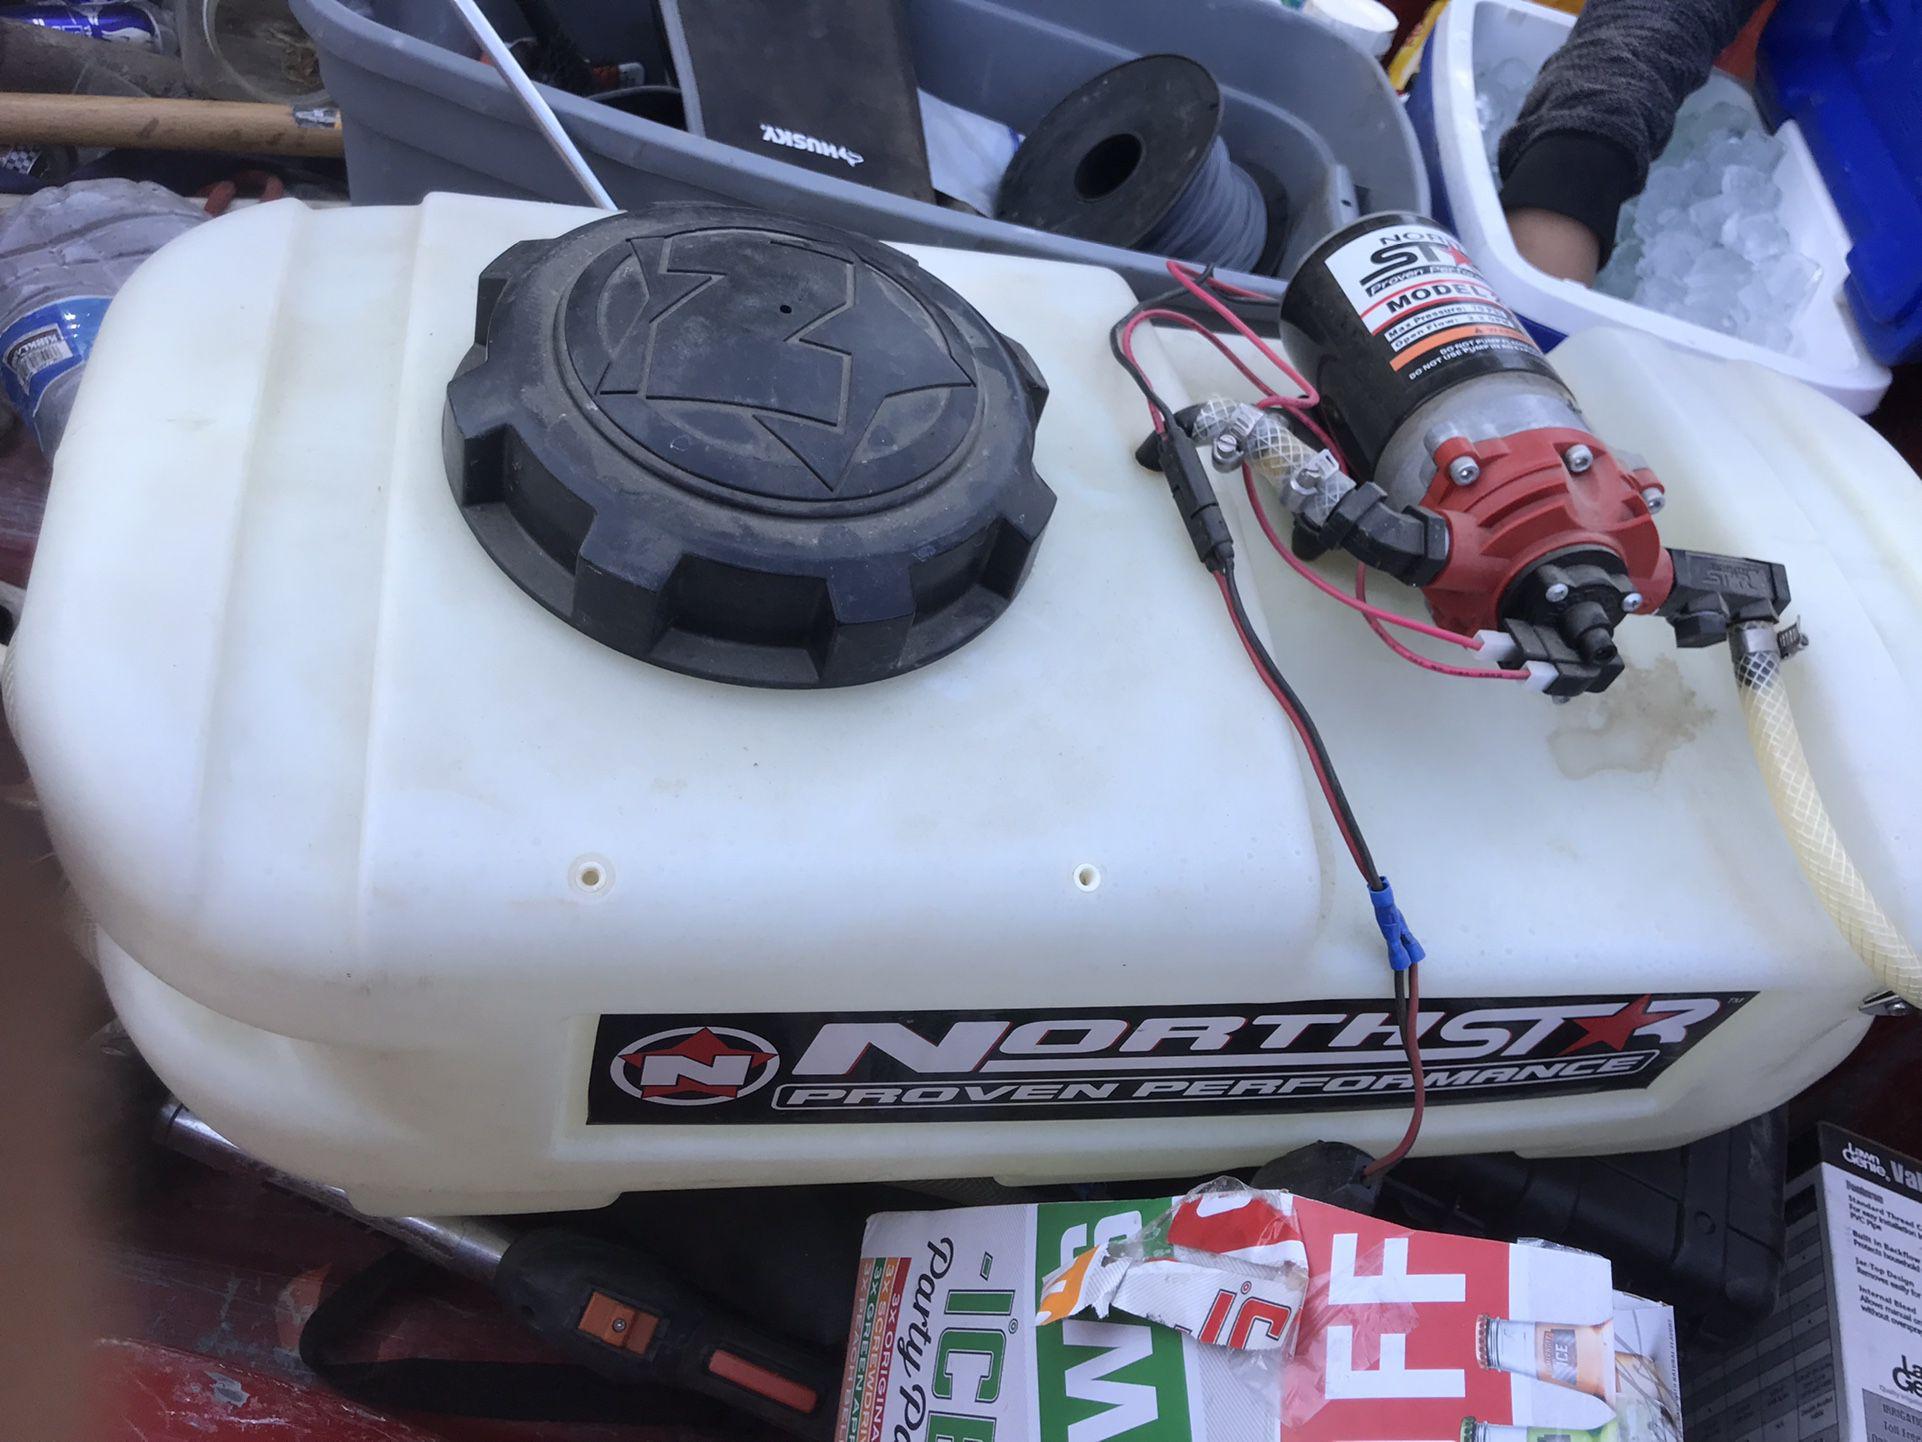 North Star High Pressure Sprayer